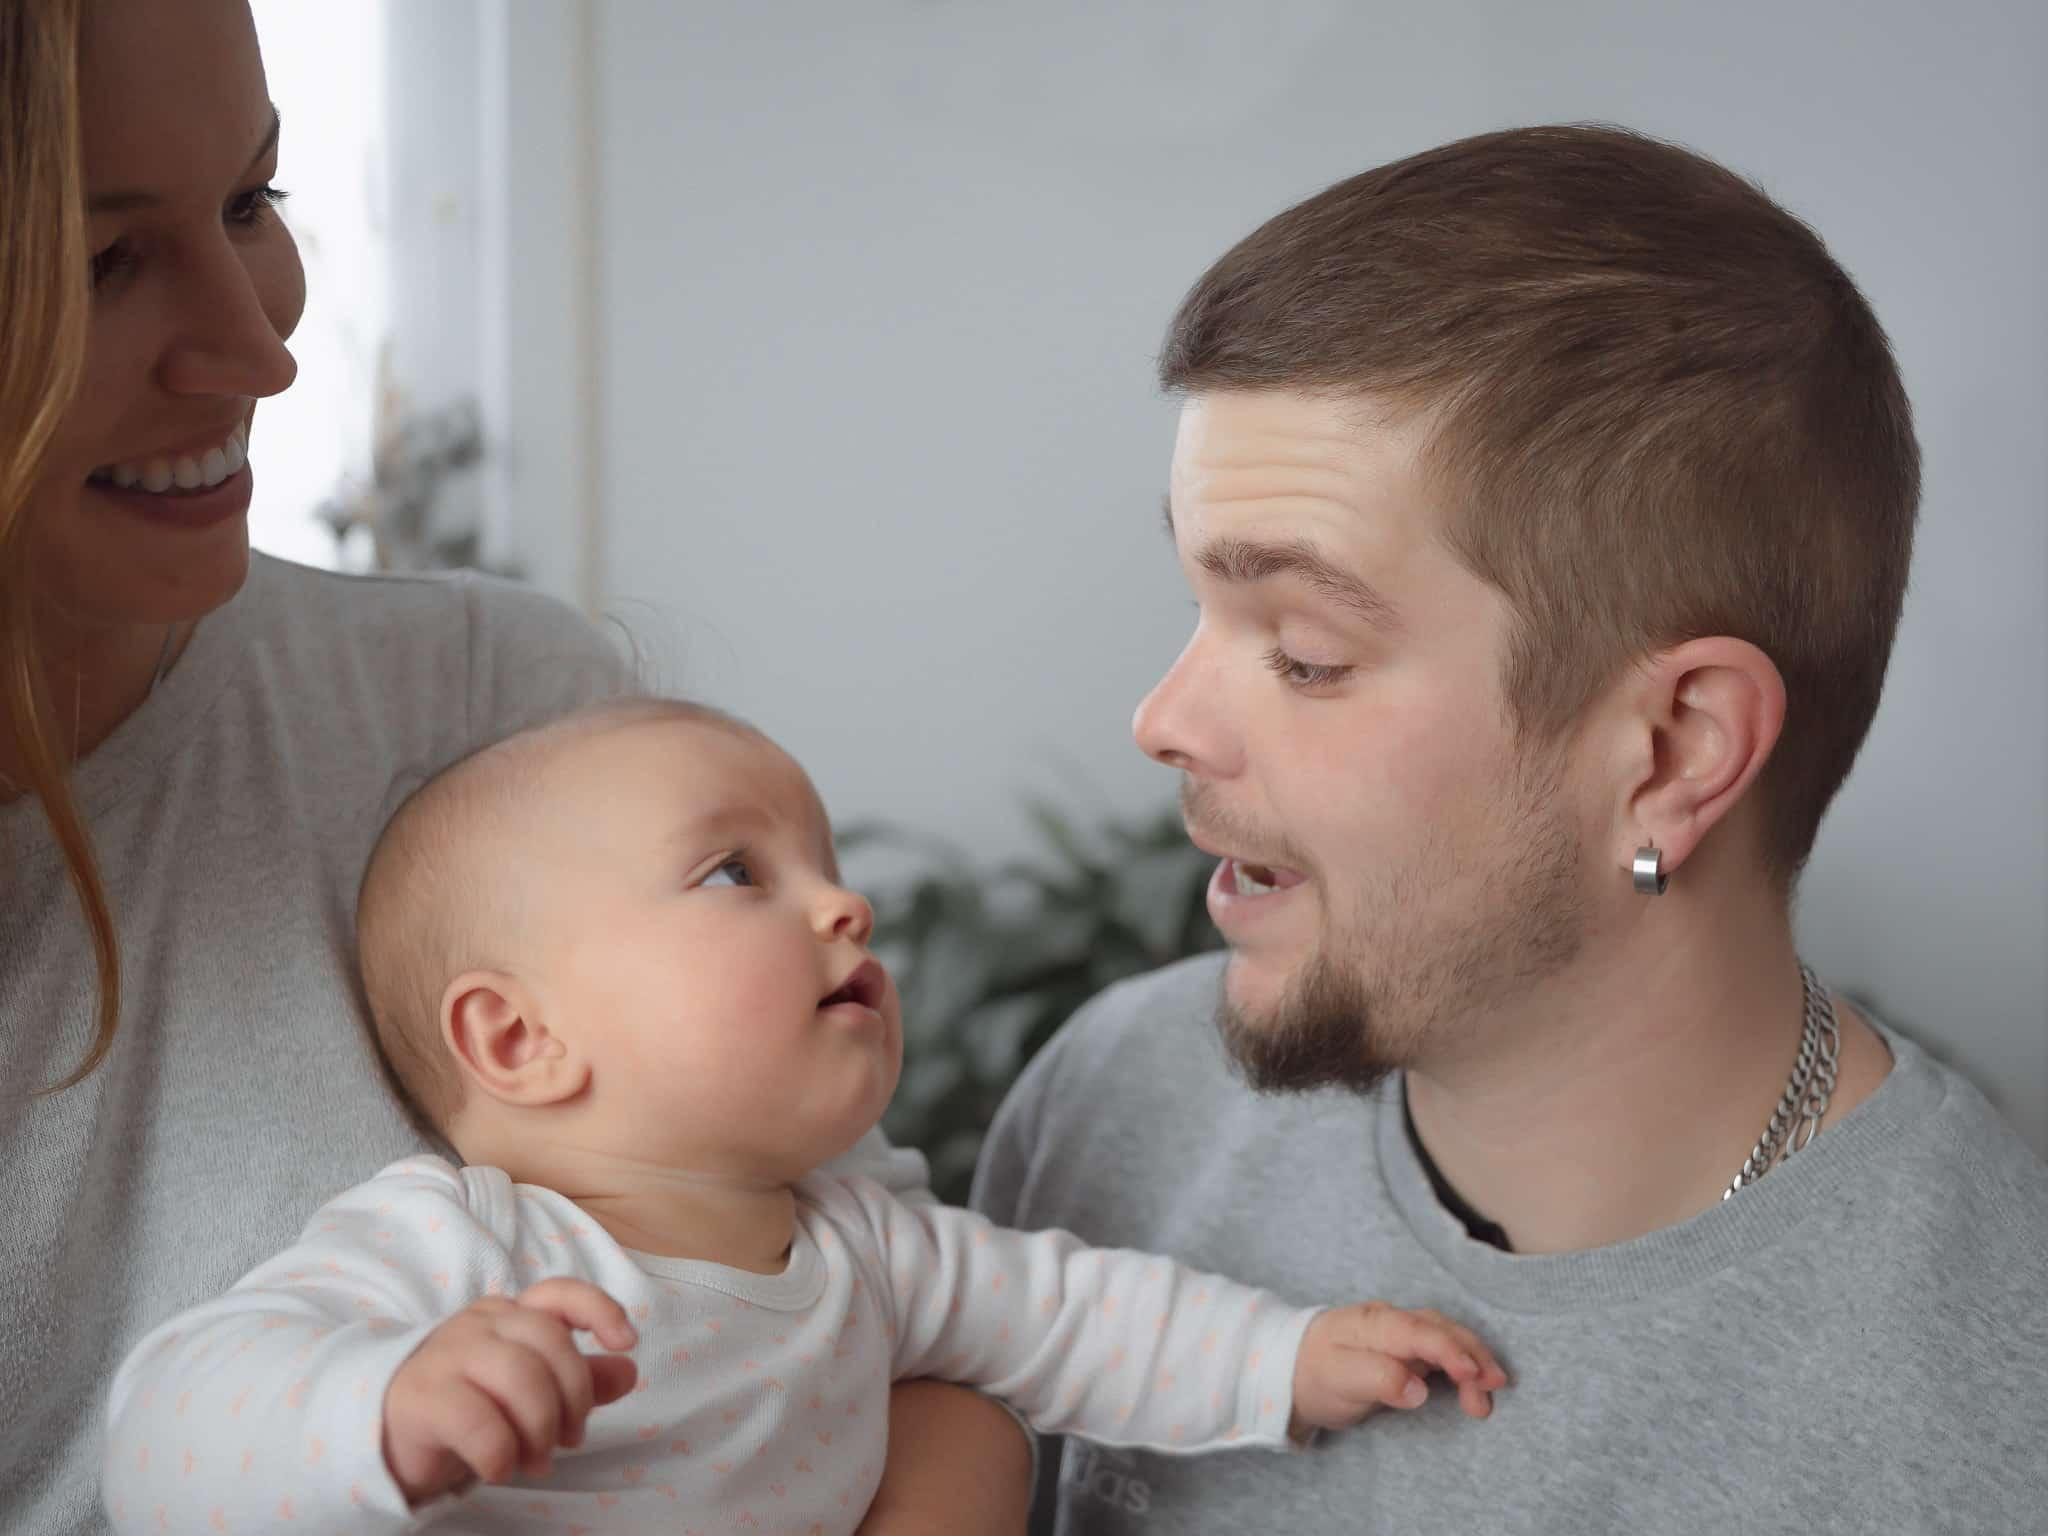 Bildoptimierung_Familien_Fotoshooting_Ansbach_Fotograf_Pixel_Buddies_Thomas_Lautenbacher_10